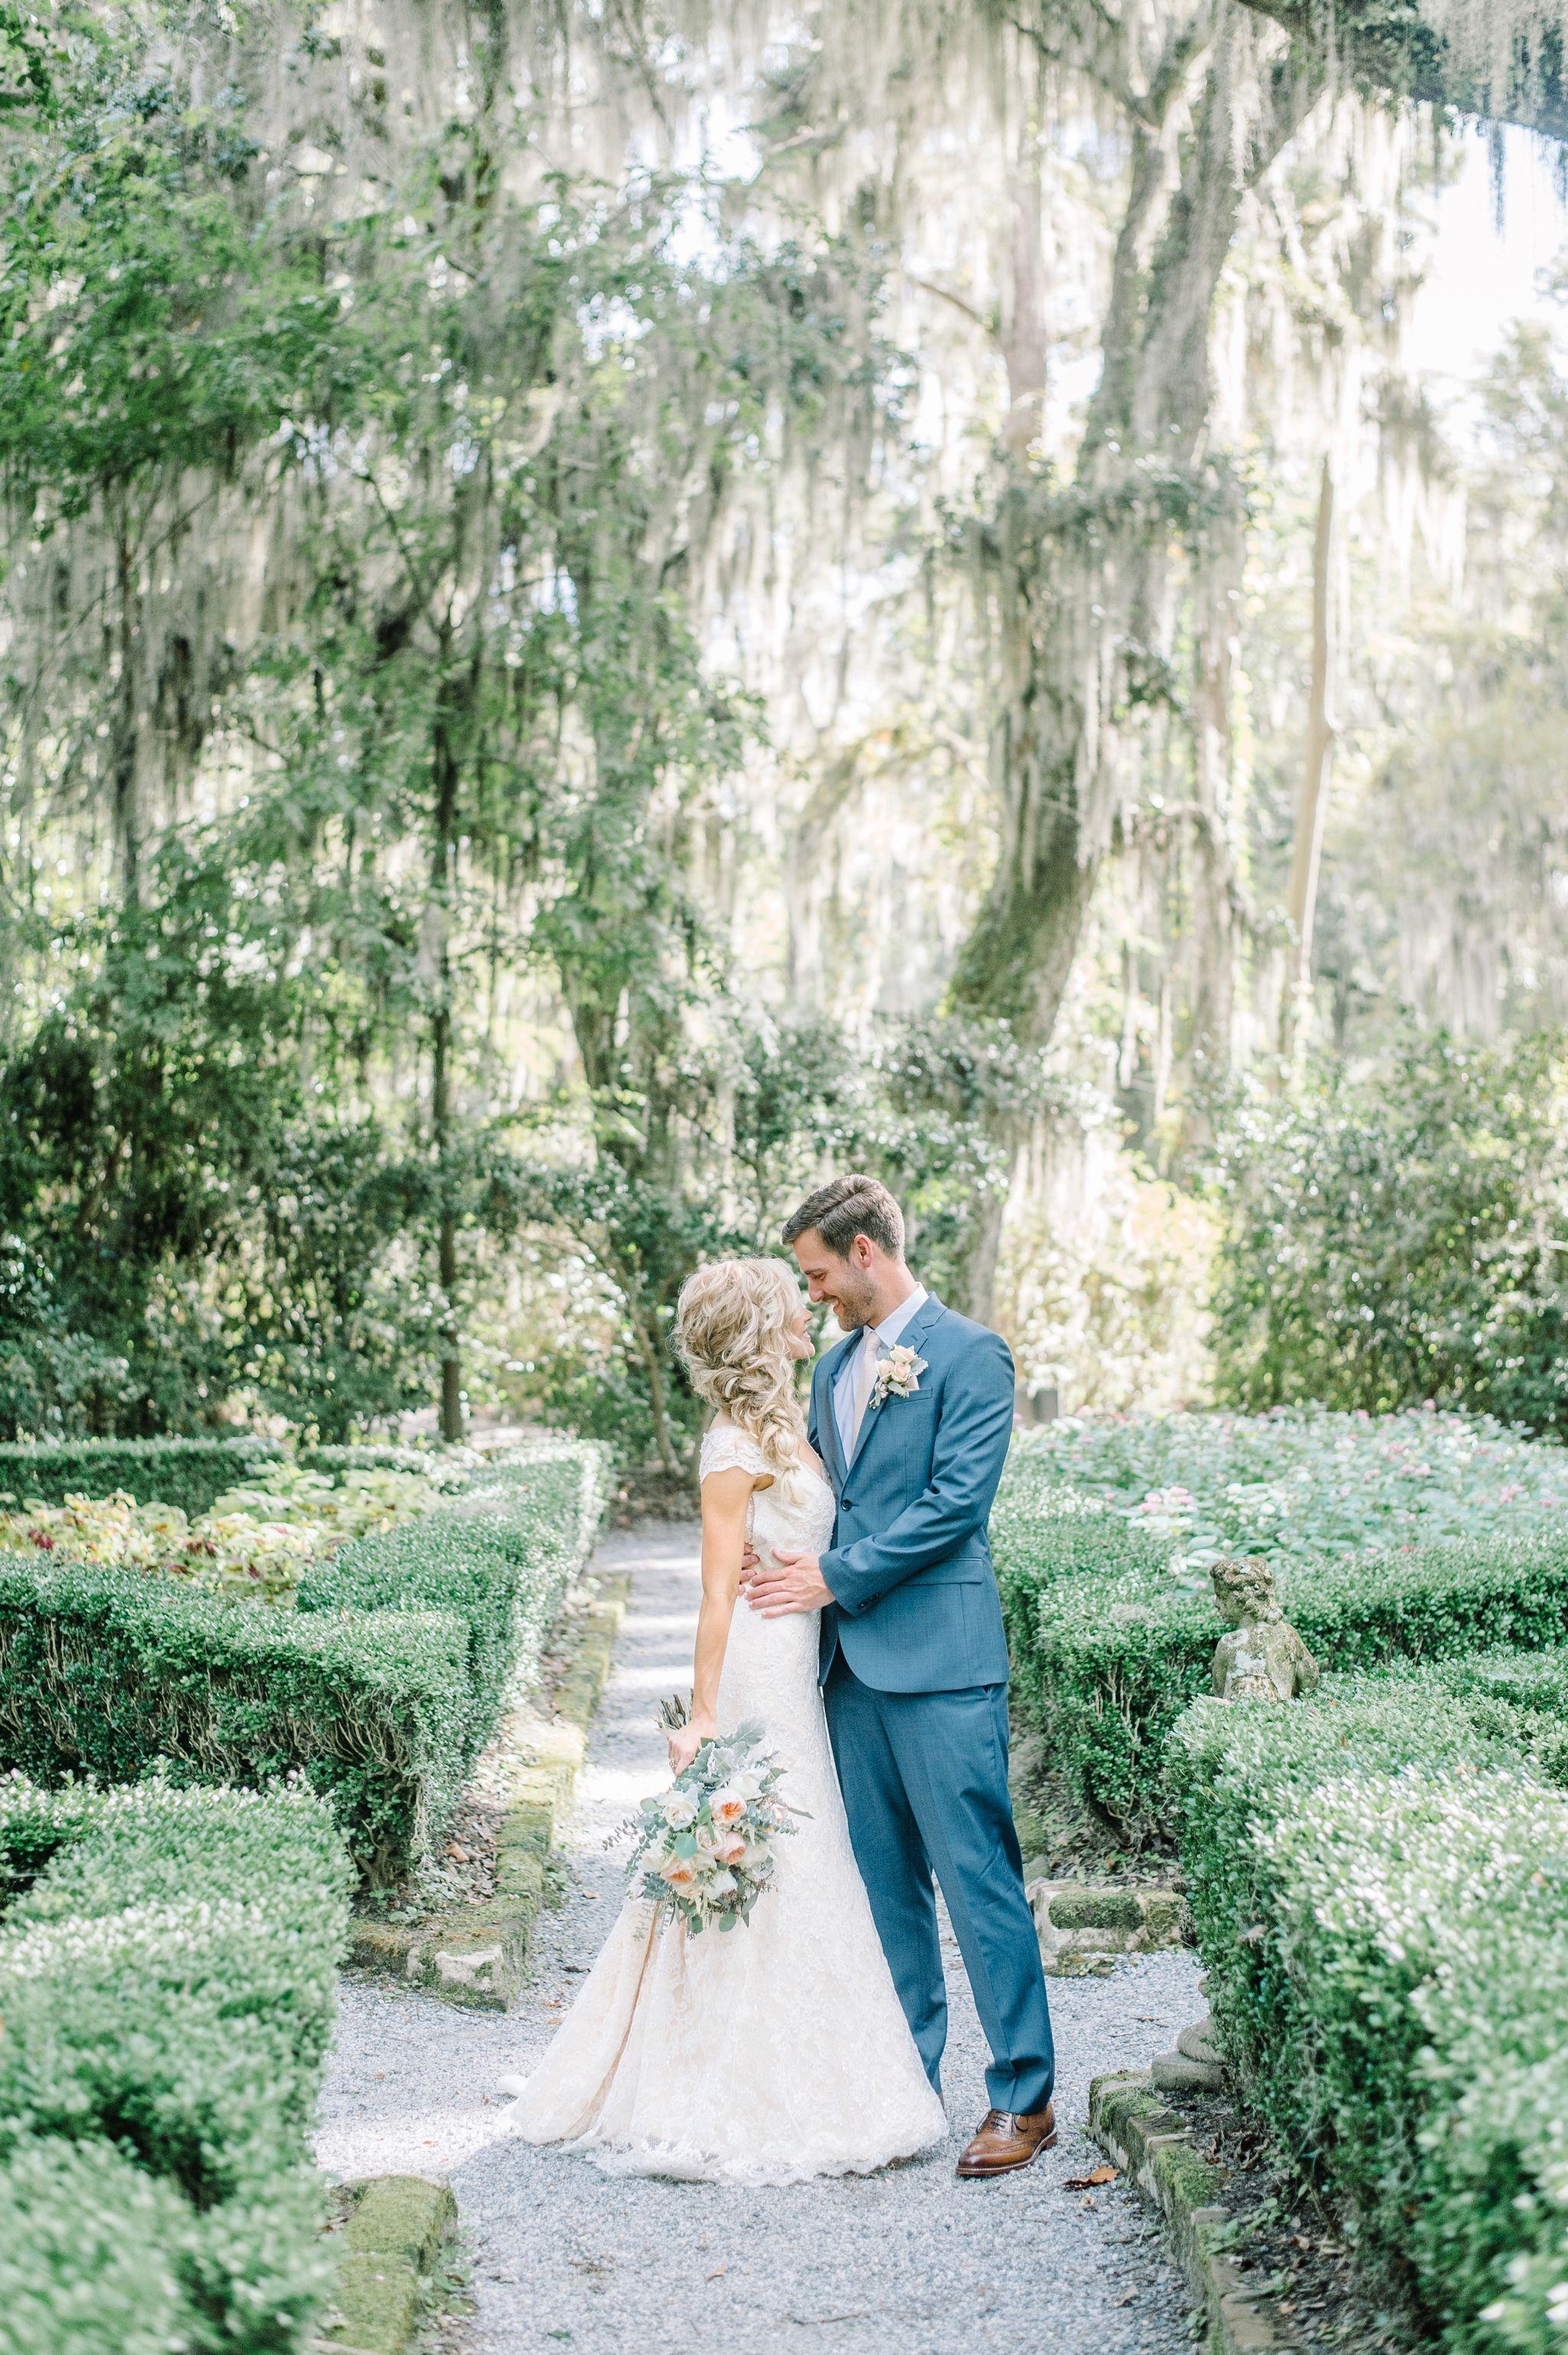 Jeremiah + Shelby's Magnolia Veranda Wedding (With images